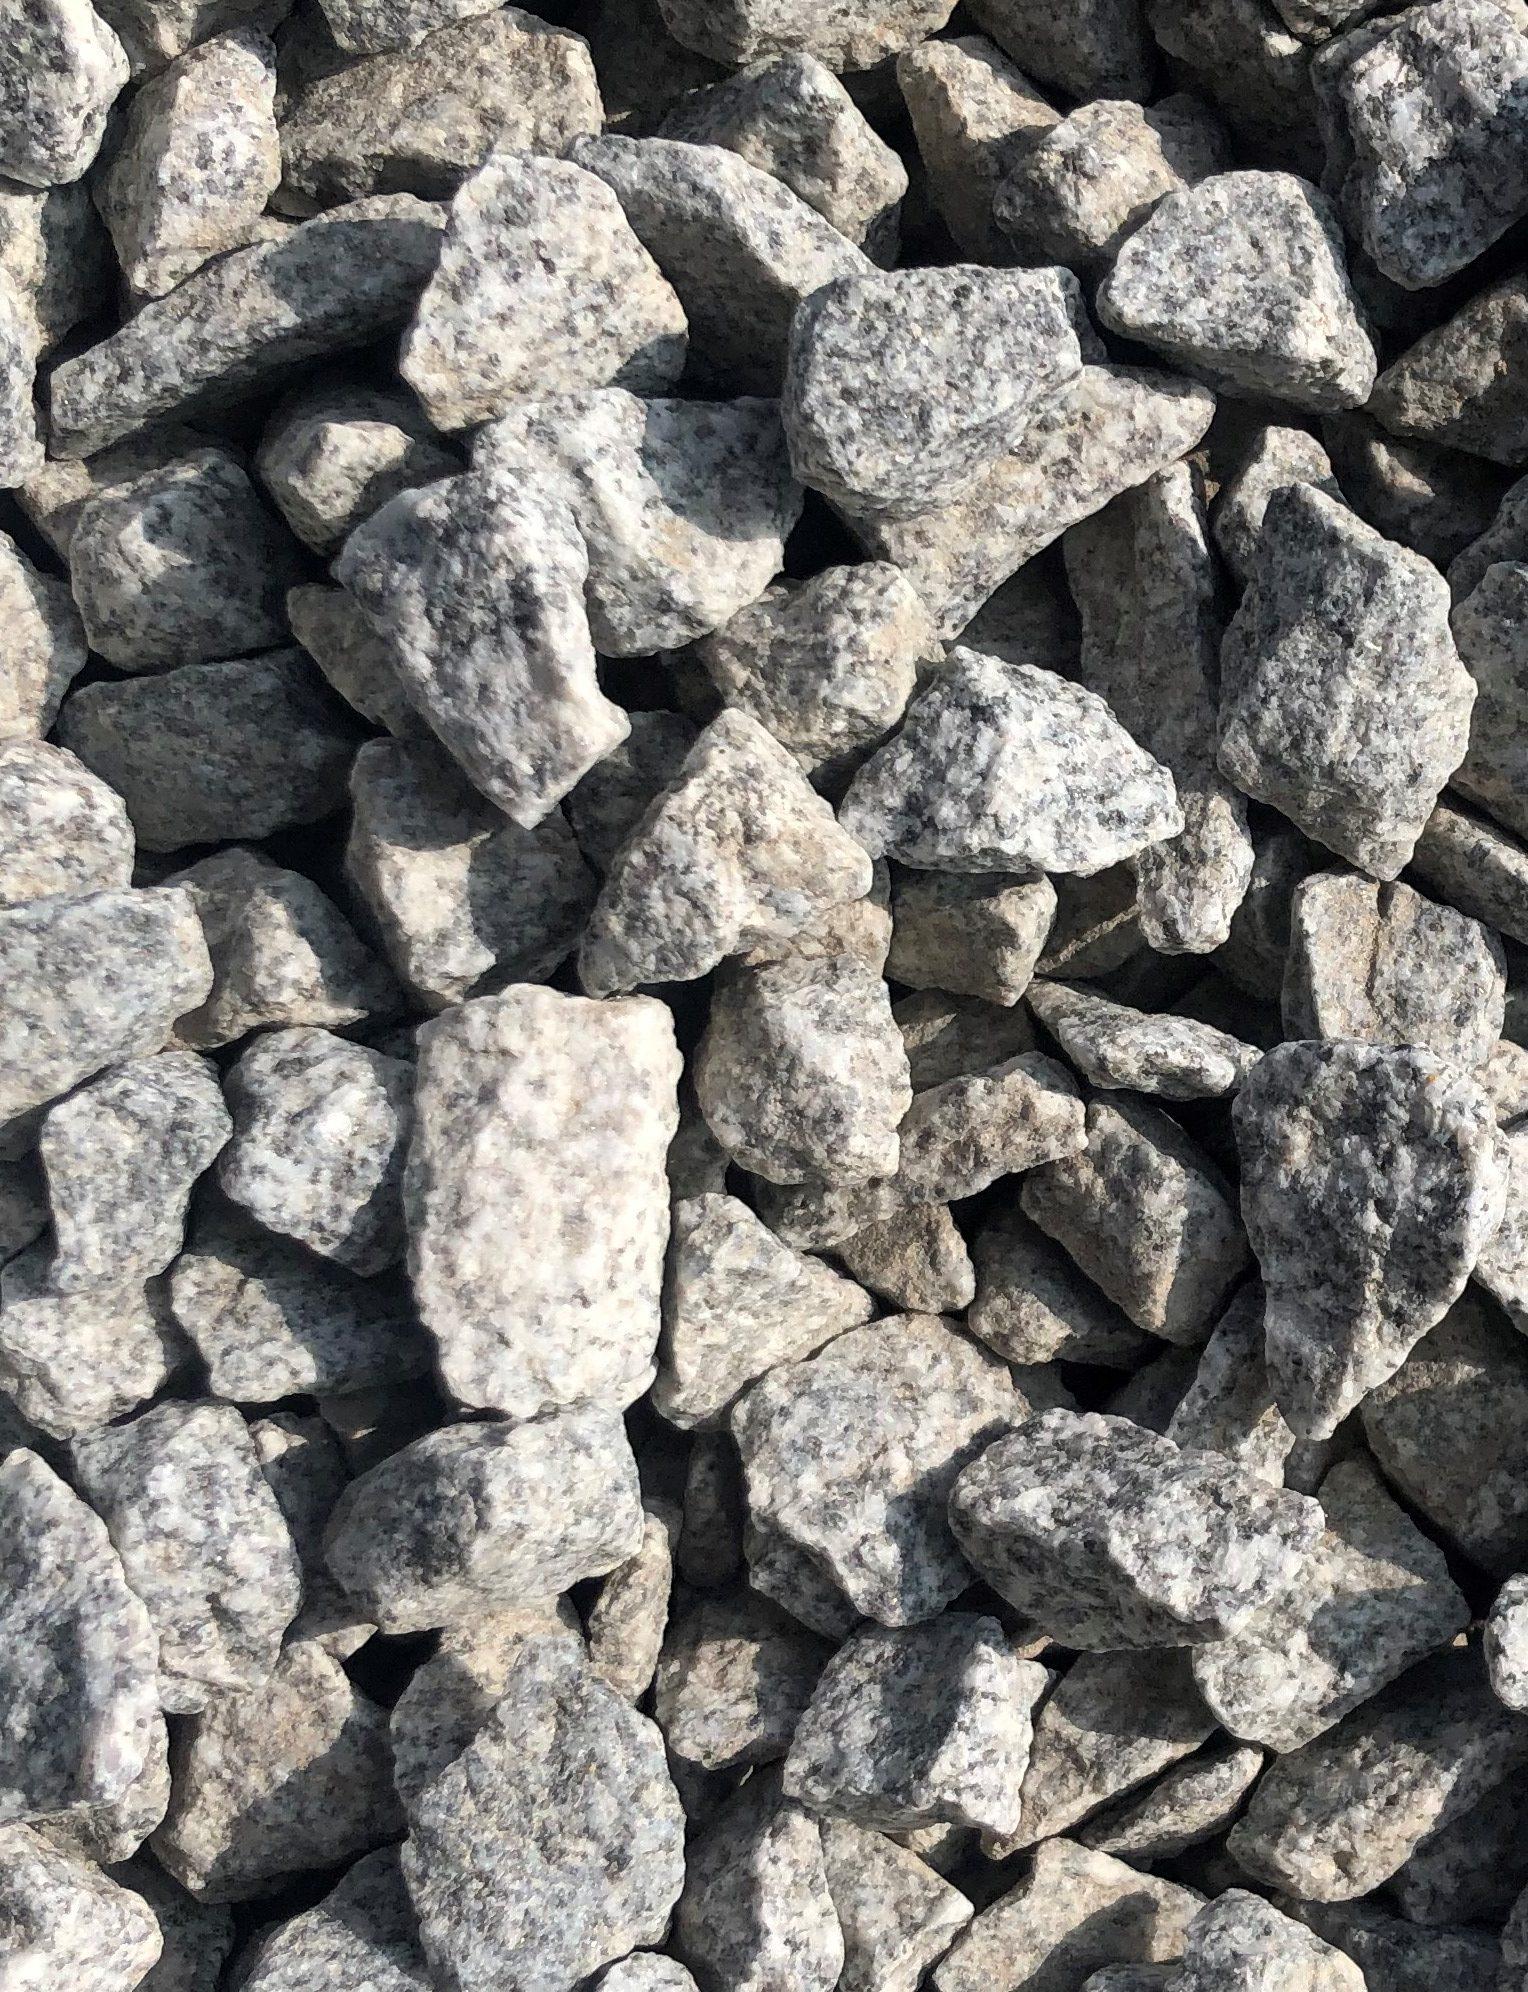 Granitsplitt, anthrazit-grau